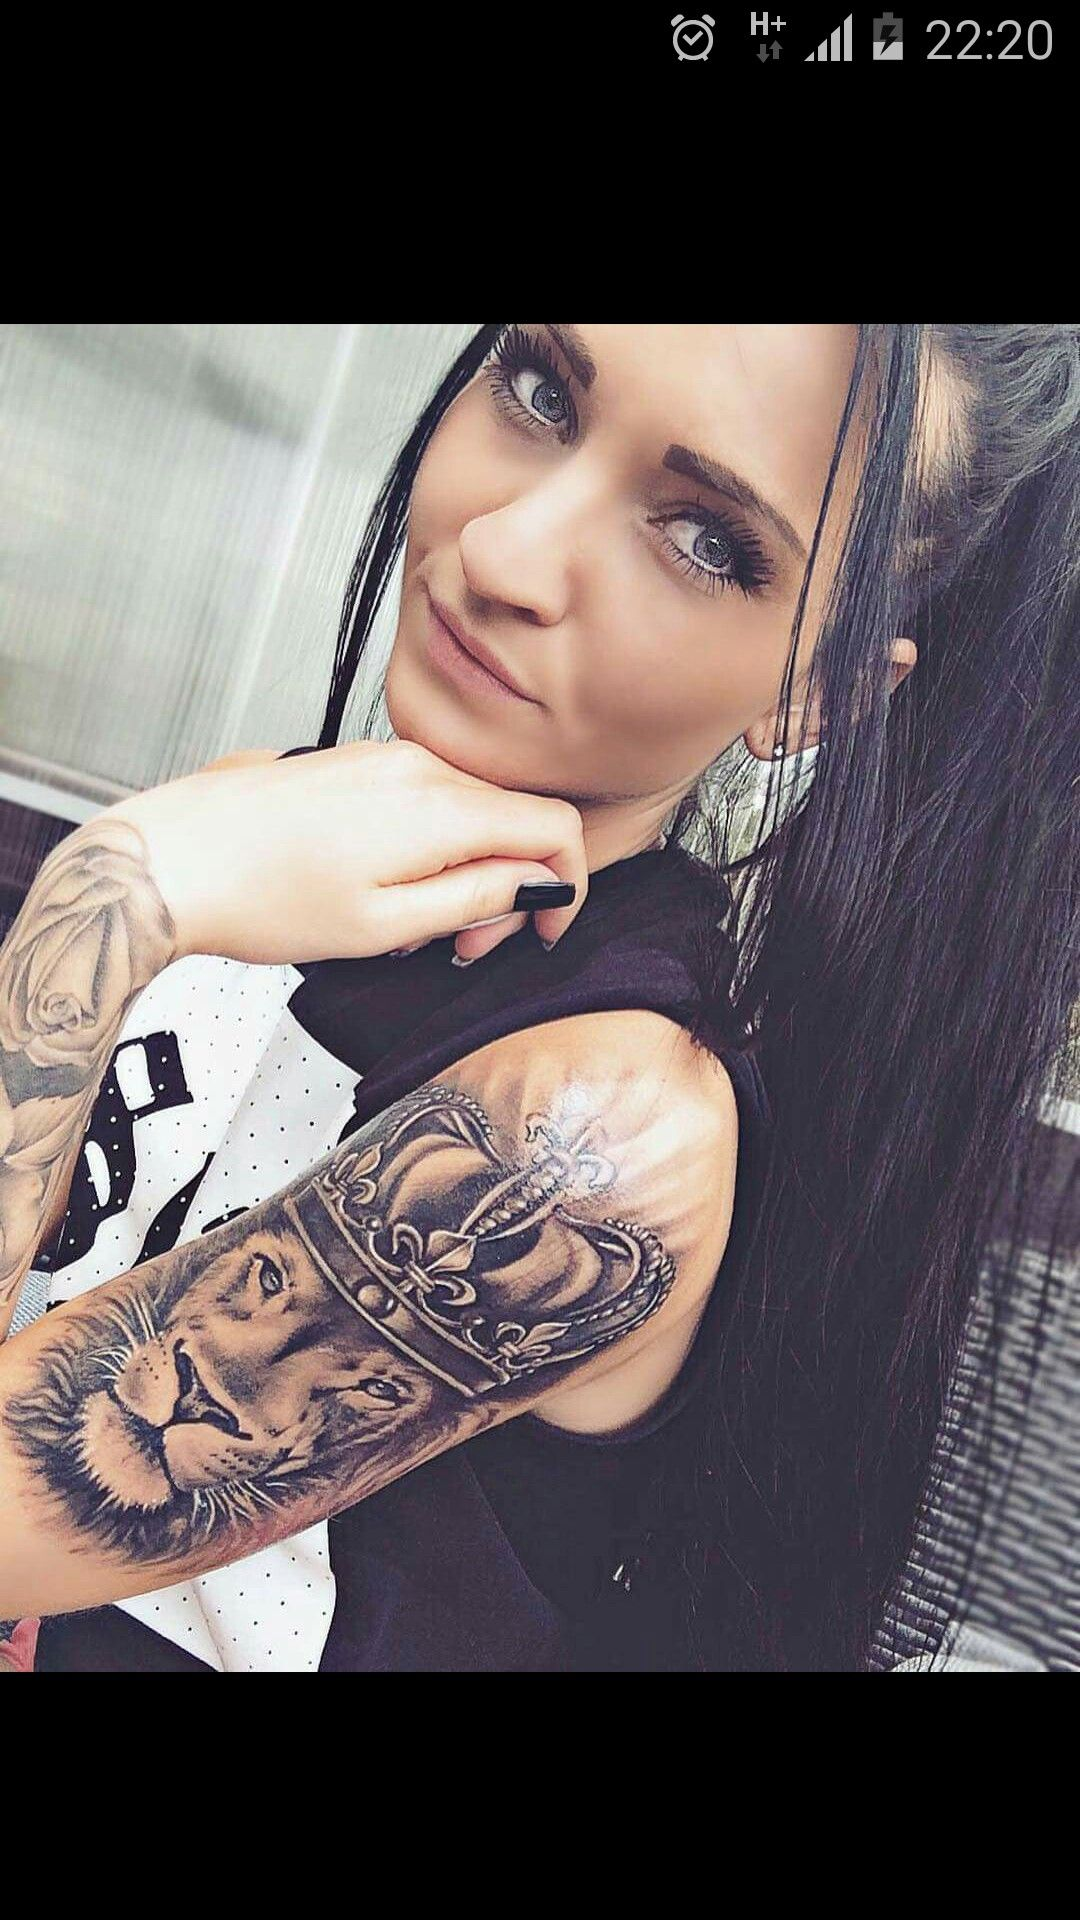 Pin by charlotte joseph on tattoos beautiful tattoos